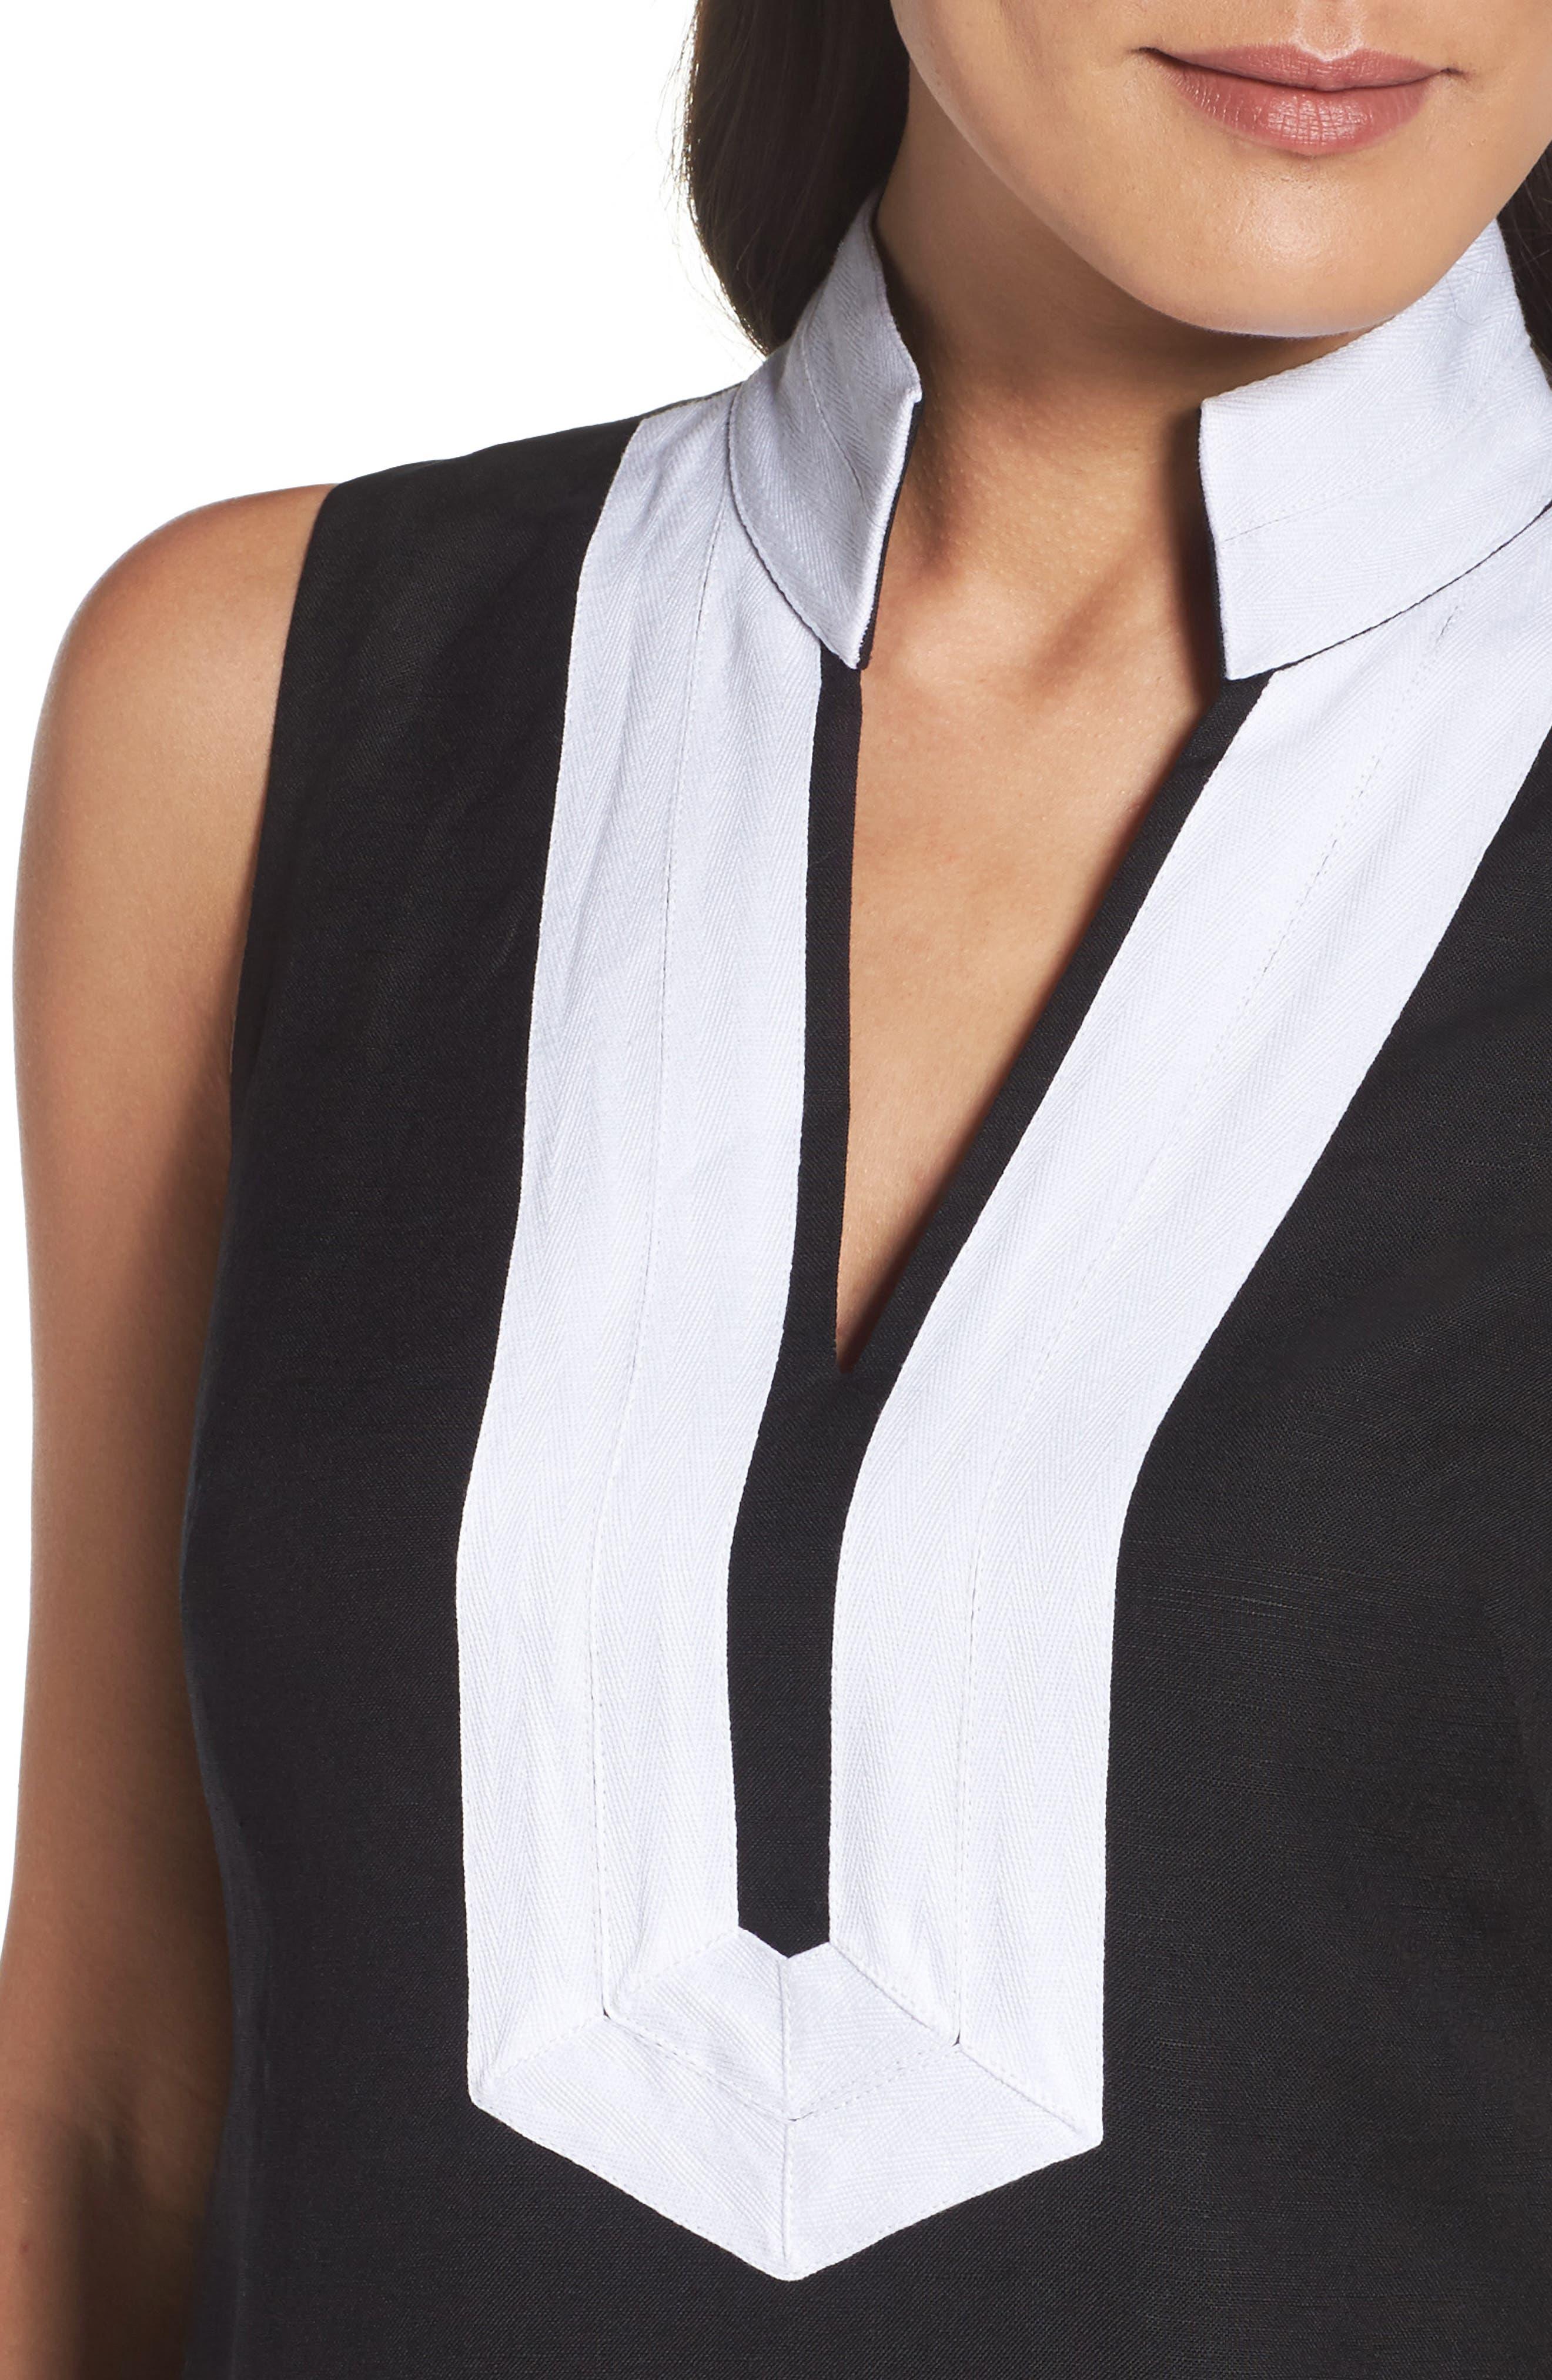 Mandarin Collar Linen Blend Sheath Dress,                             Alternate thumbnail 4, color,                             006